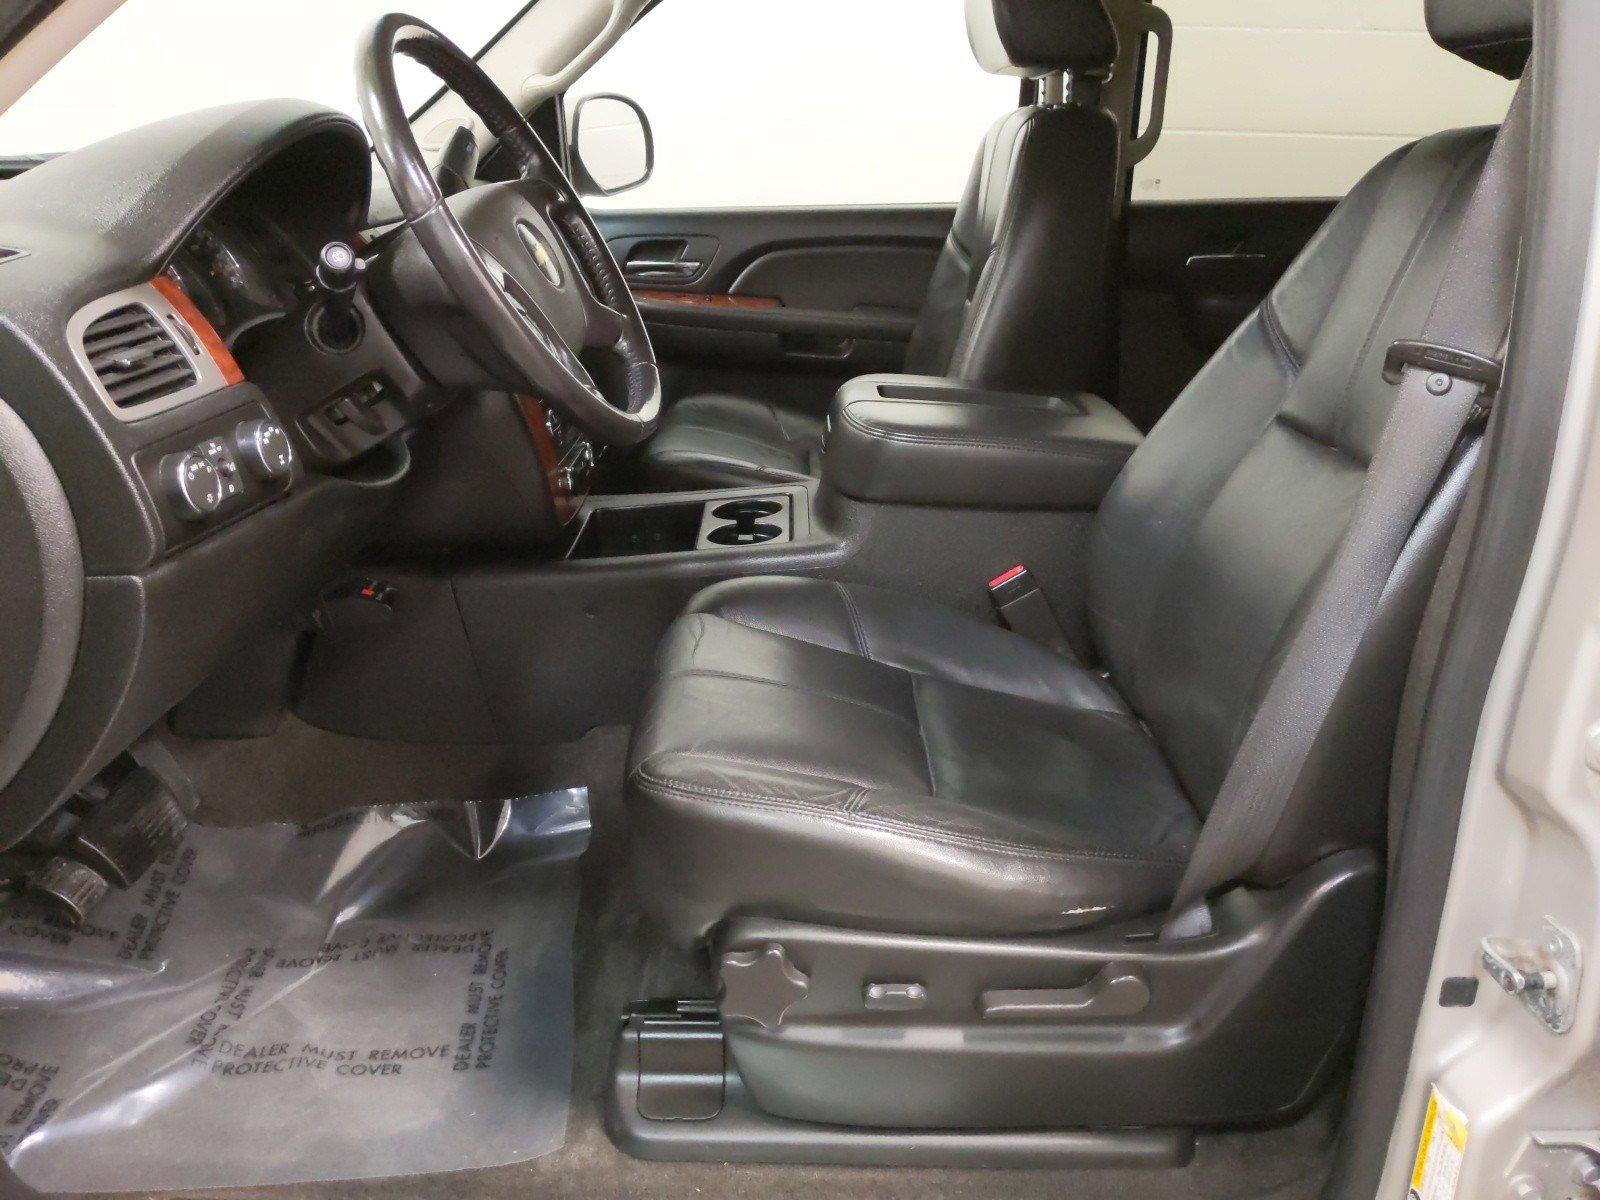 Used 2008 Chevrolet Tahoe LT w/2LT Sport Utility for sale in Lincoln NE